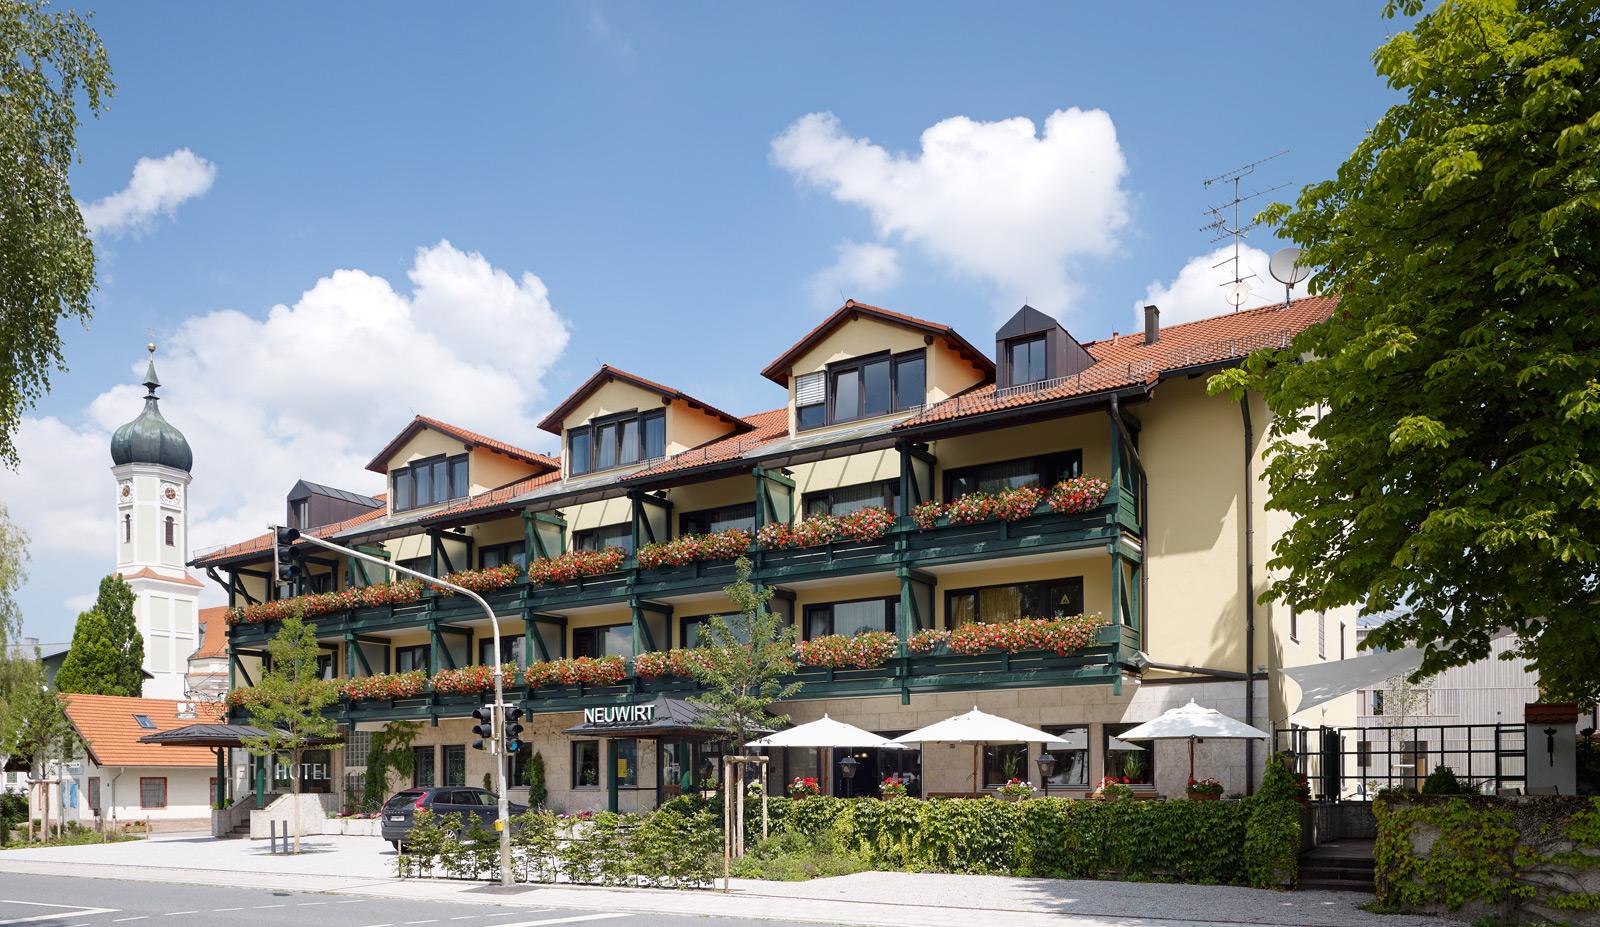 NEUWIRT - APARTMENTS, HOTEL & RESTAURANT | Münchnerstrasse 4, 85604 Zorneding